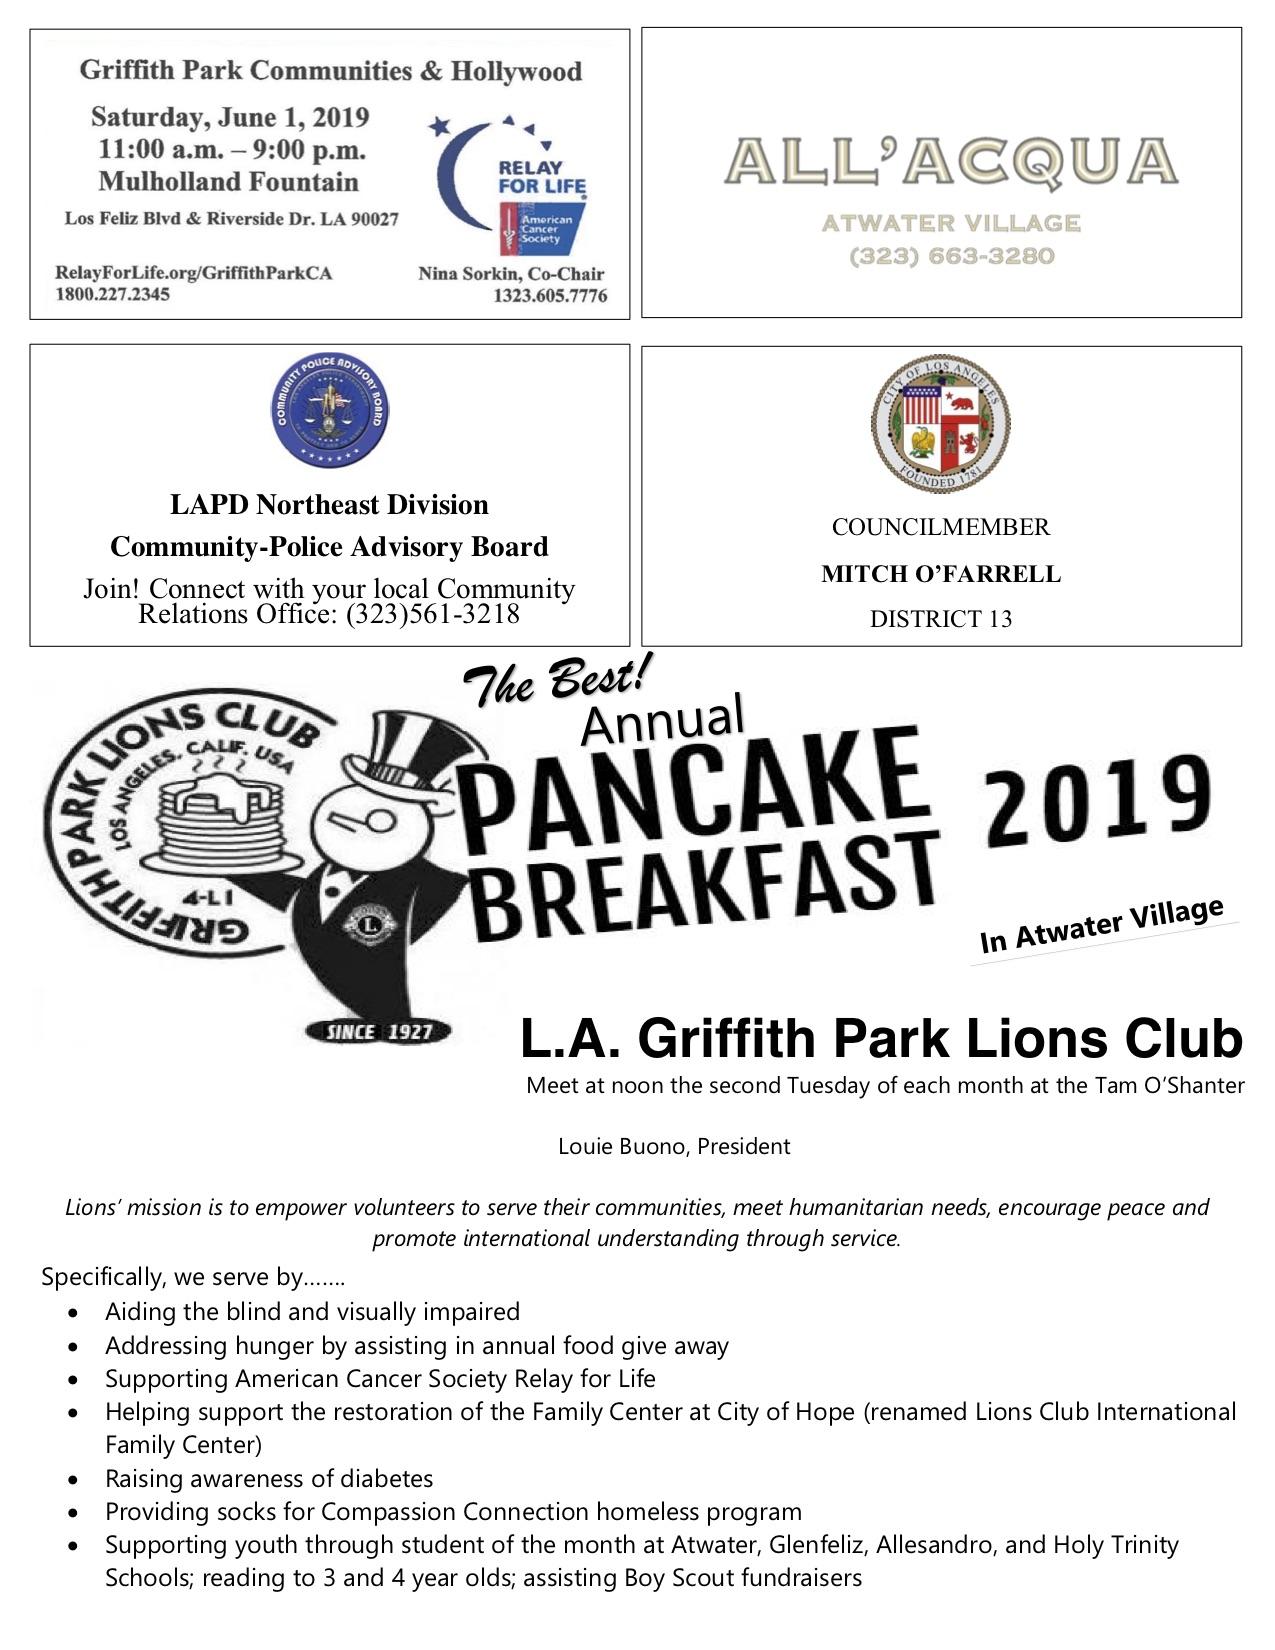 Pancake Breakfast 2019. 2jpg.jpg